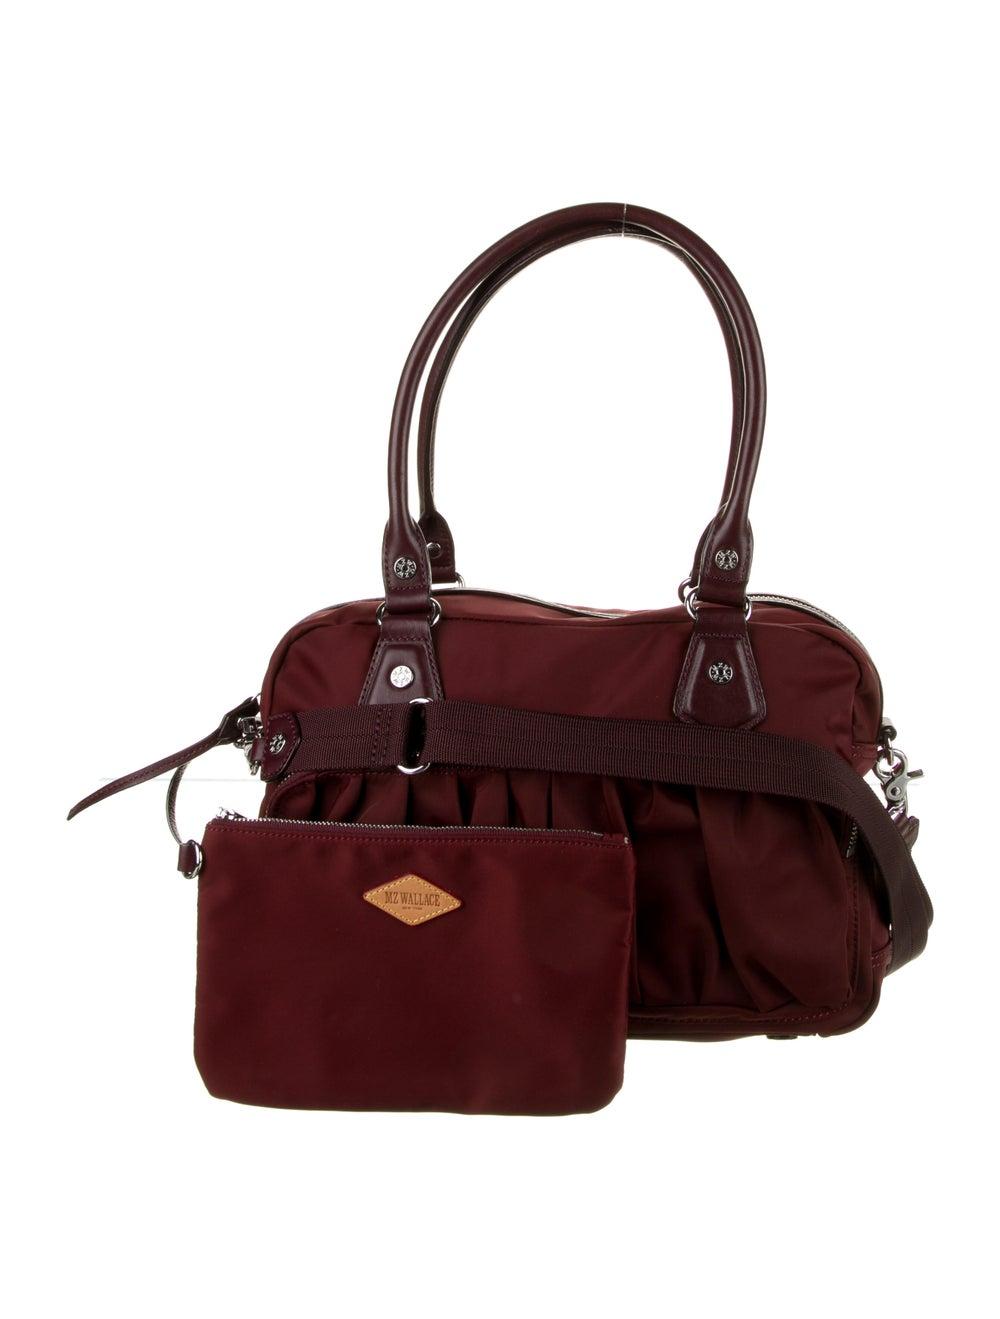 MZ Wallace Nylon Shoulder Bag Red - image 4